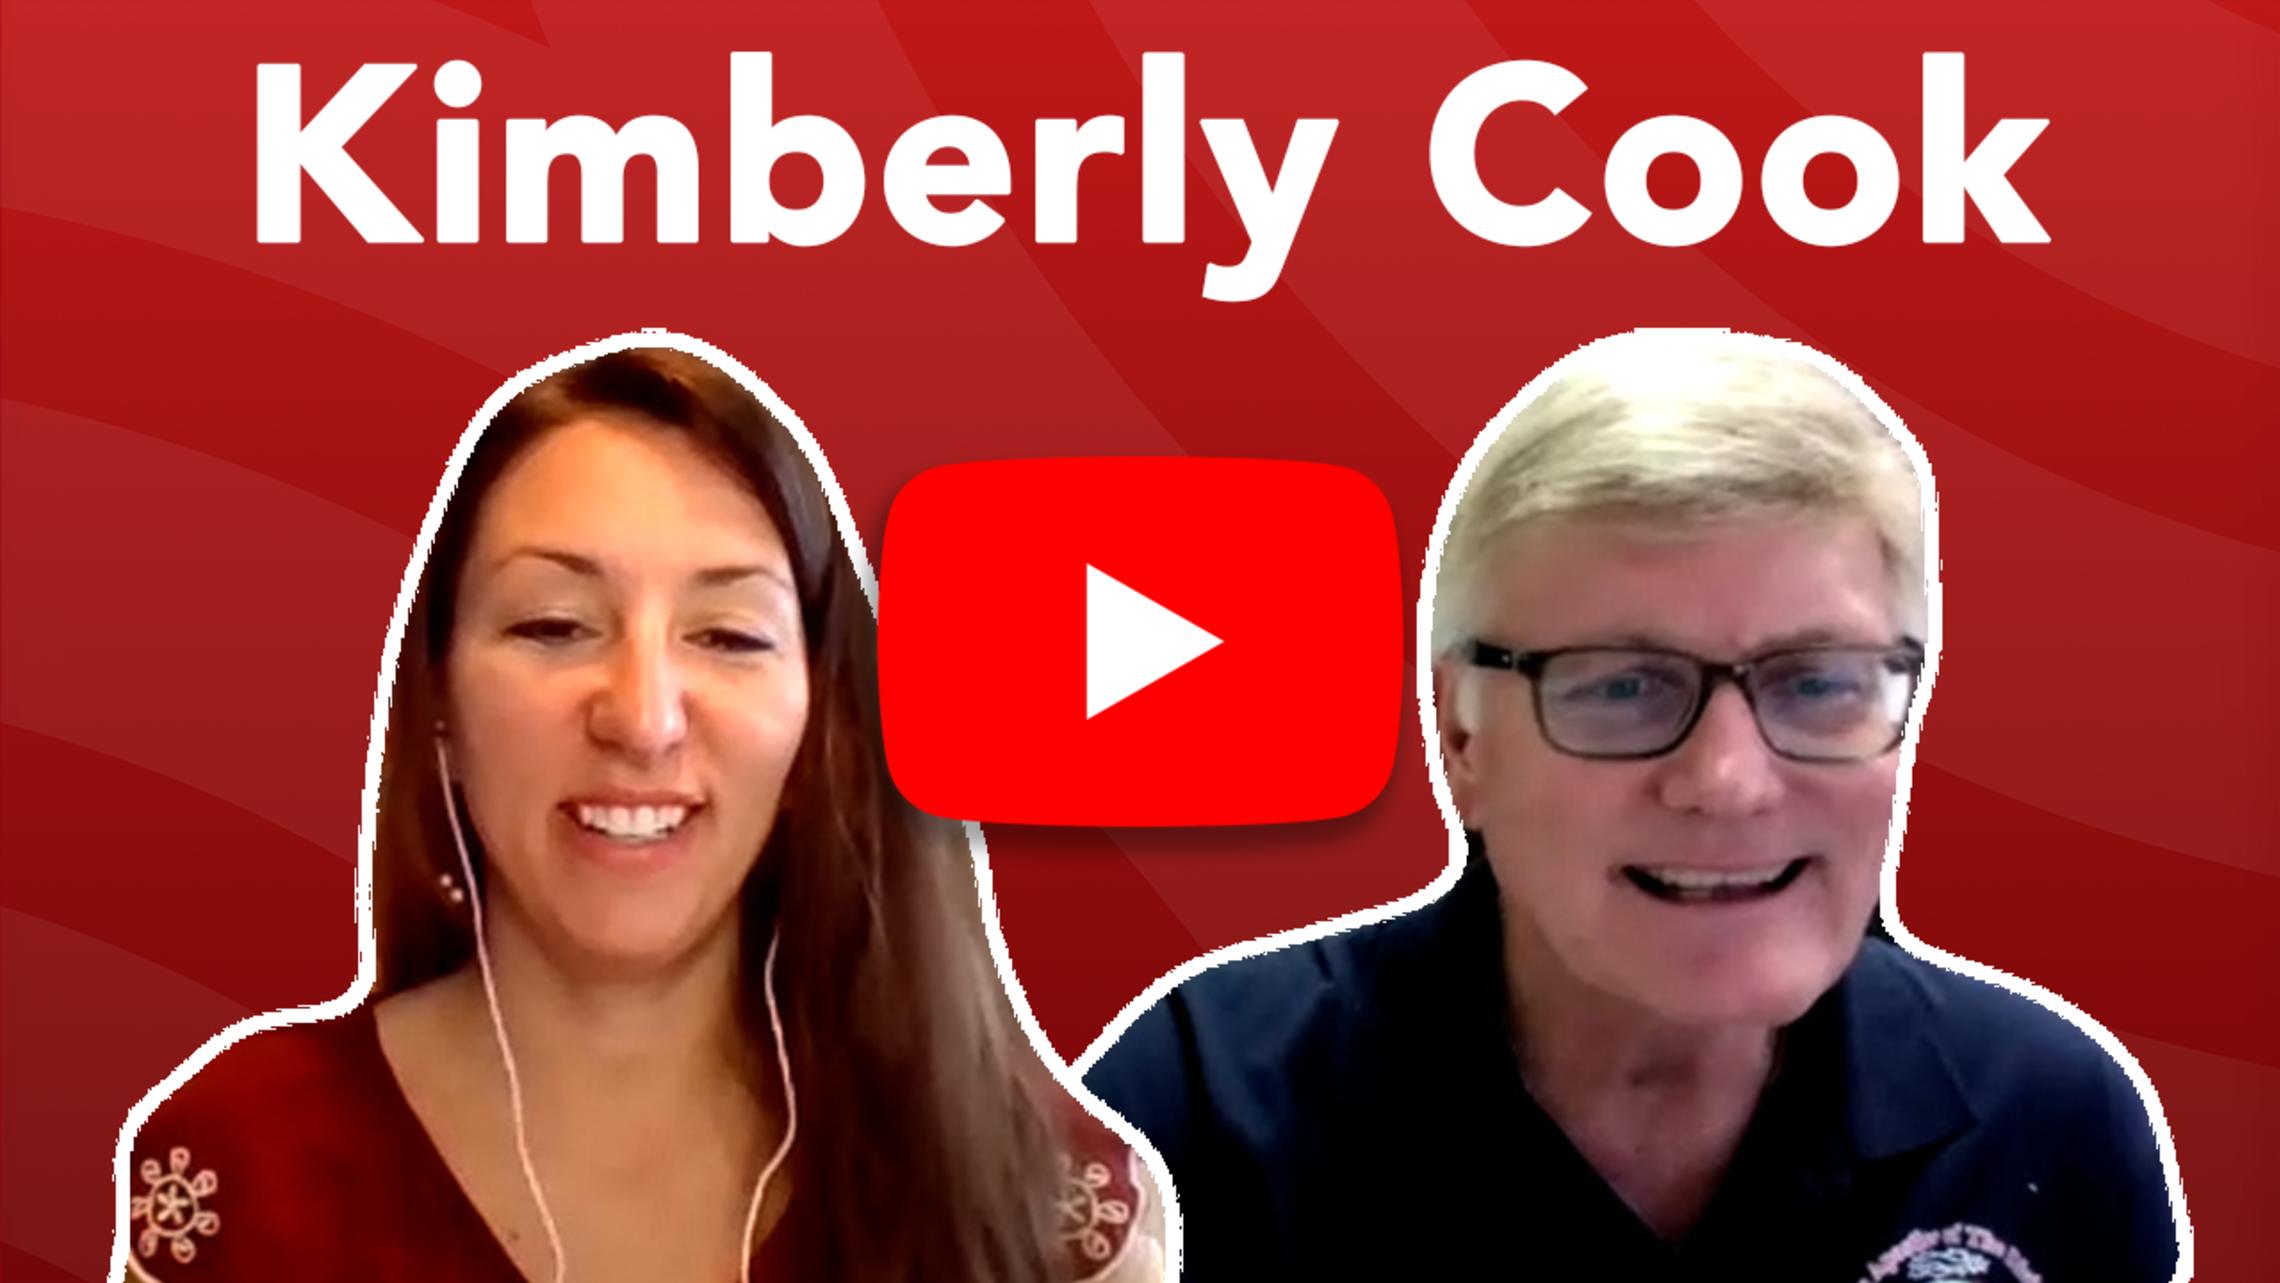 Kimberly Cook Tn Website